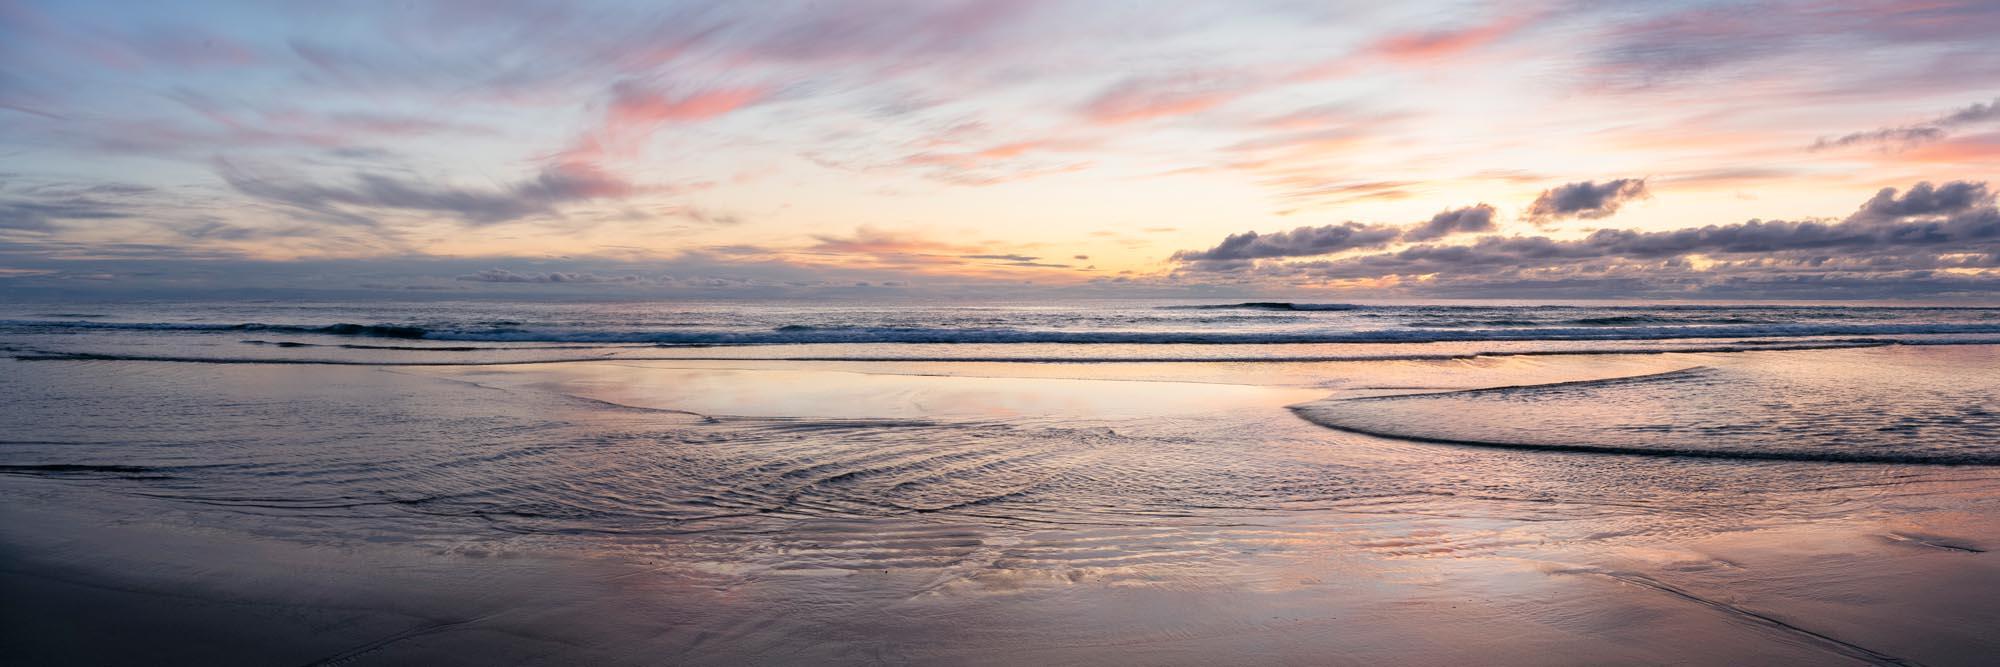 Sunset on a scottish beach